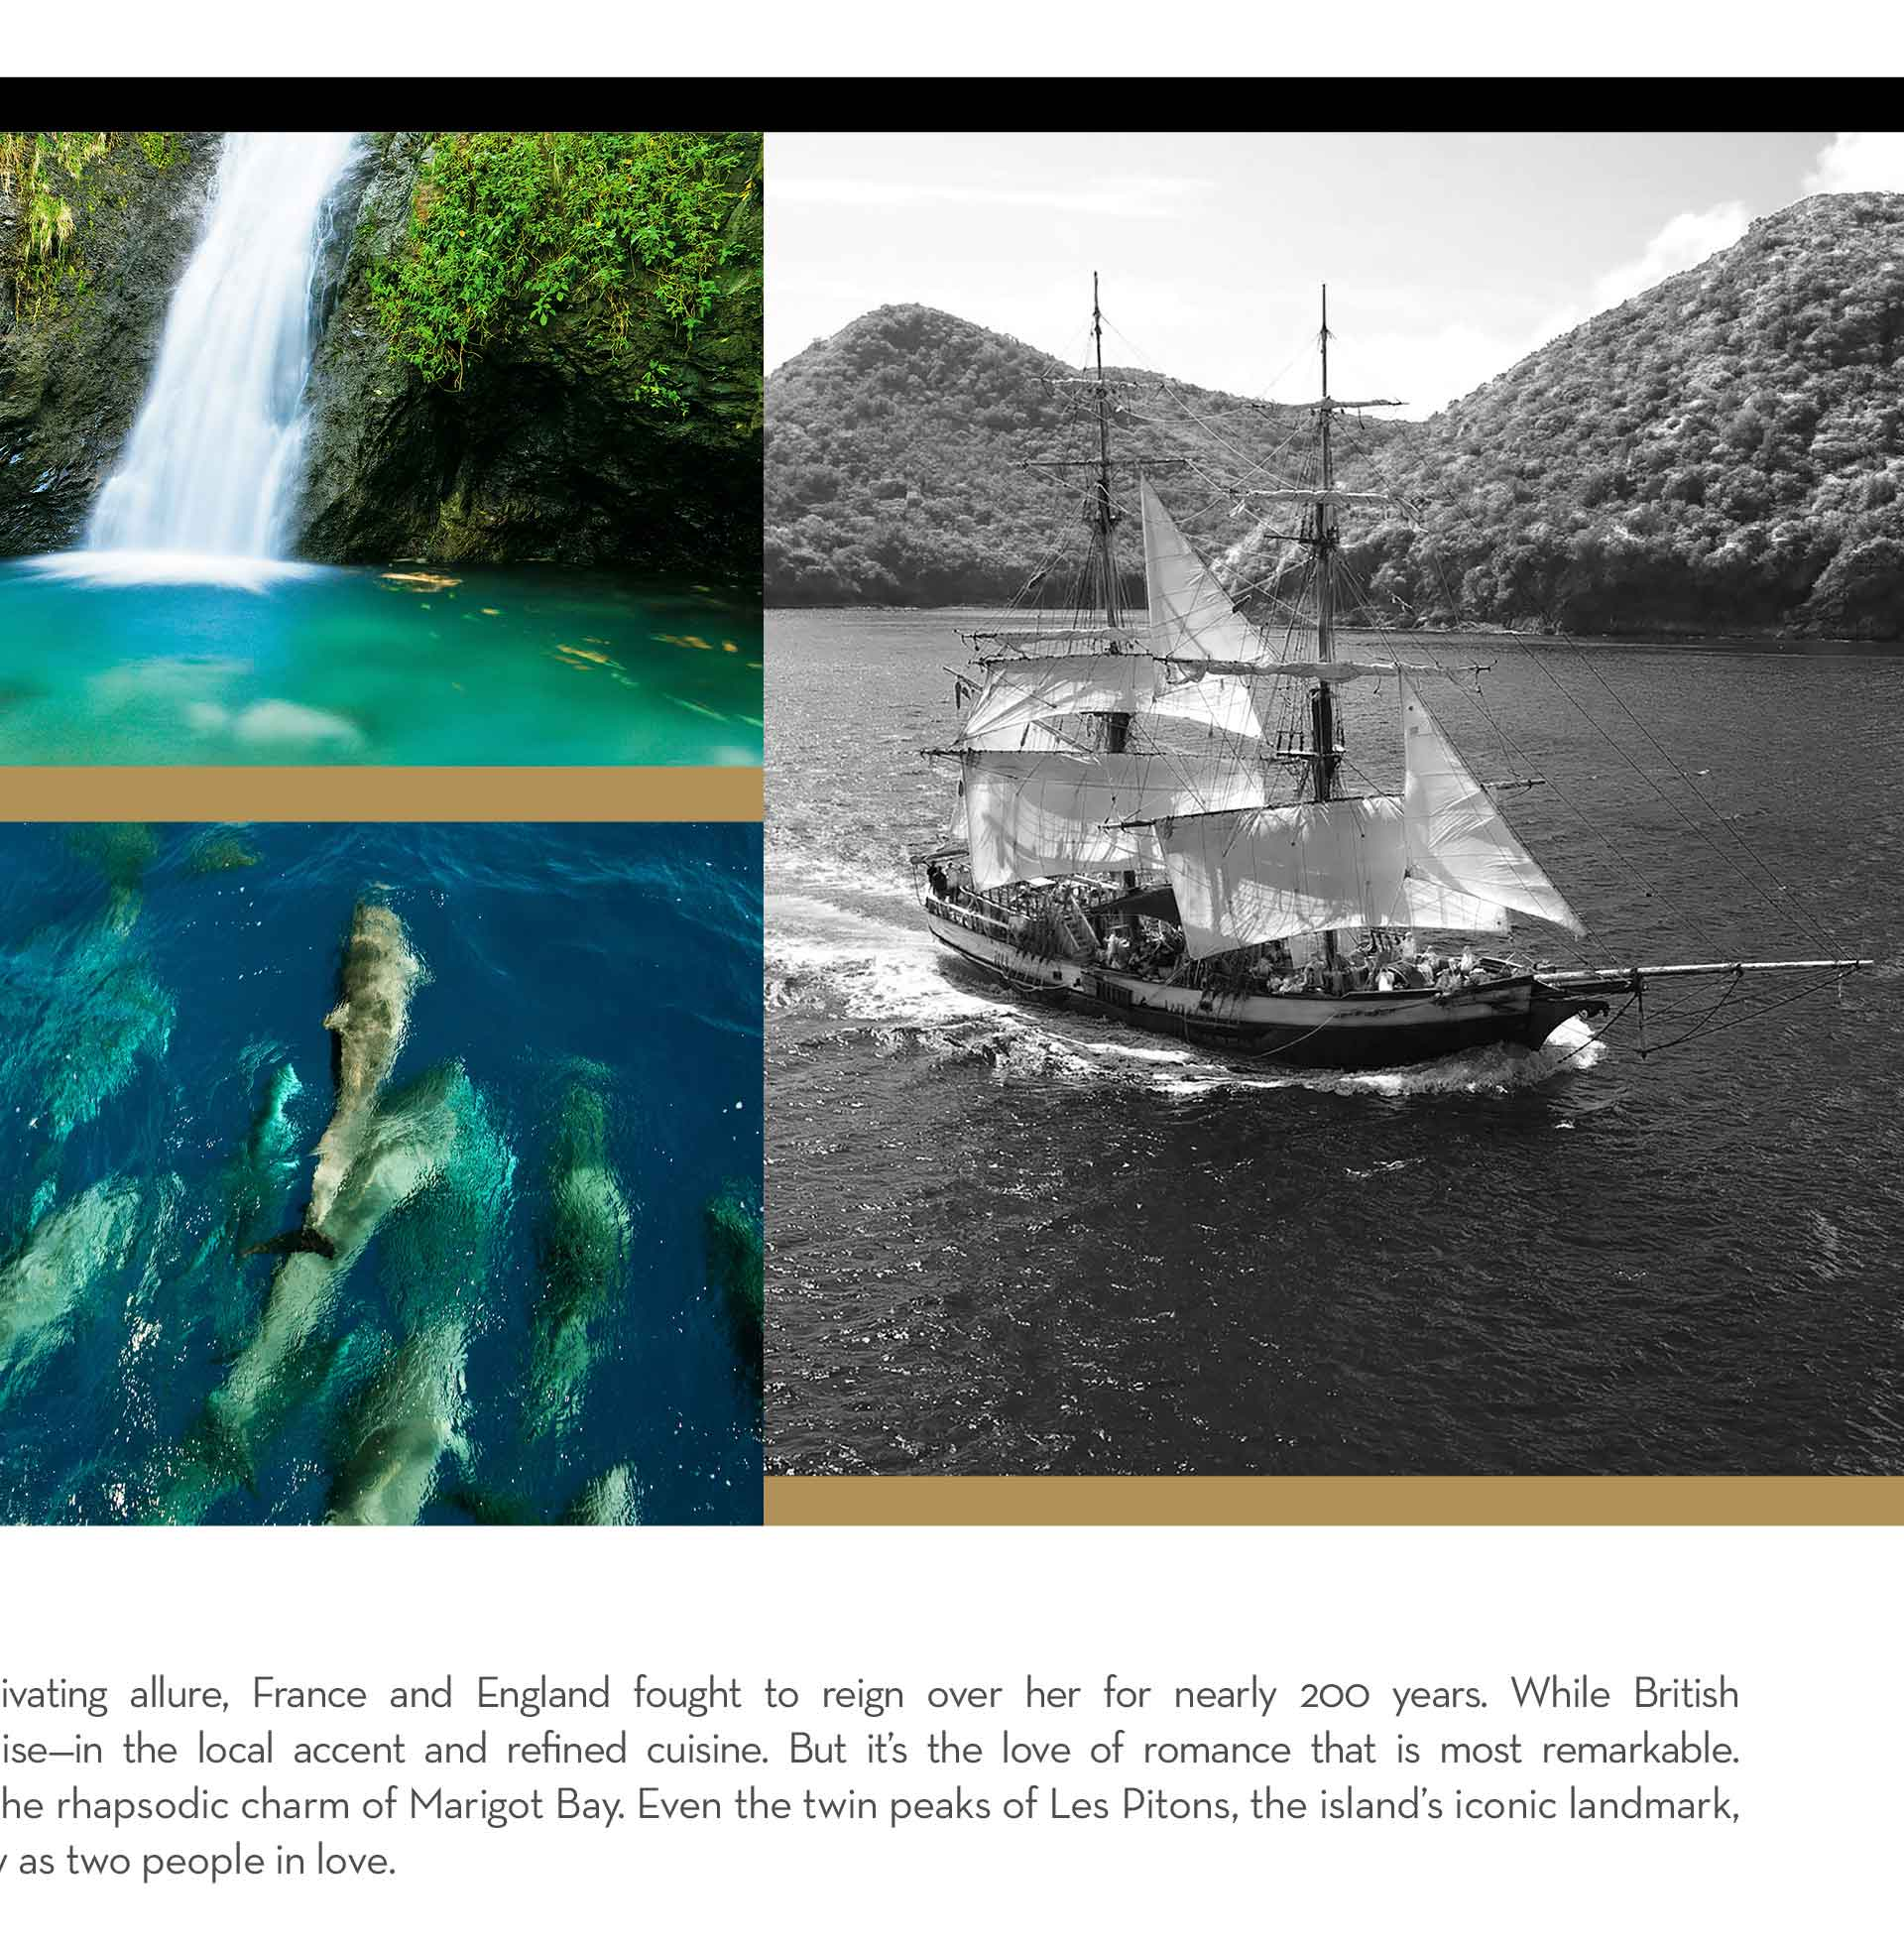 6d945cd8079 Digital Album - Sandals Regency La Toc Resort in Saint Lucia